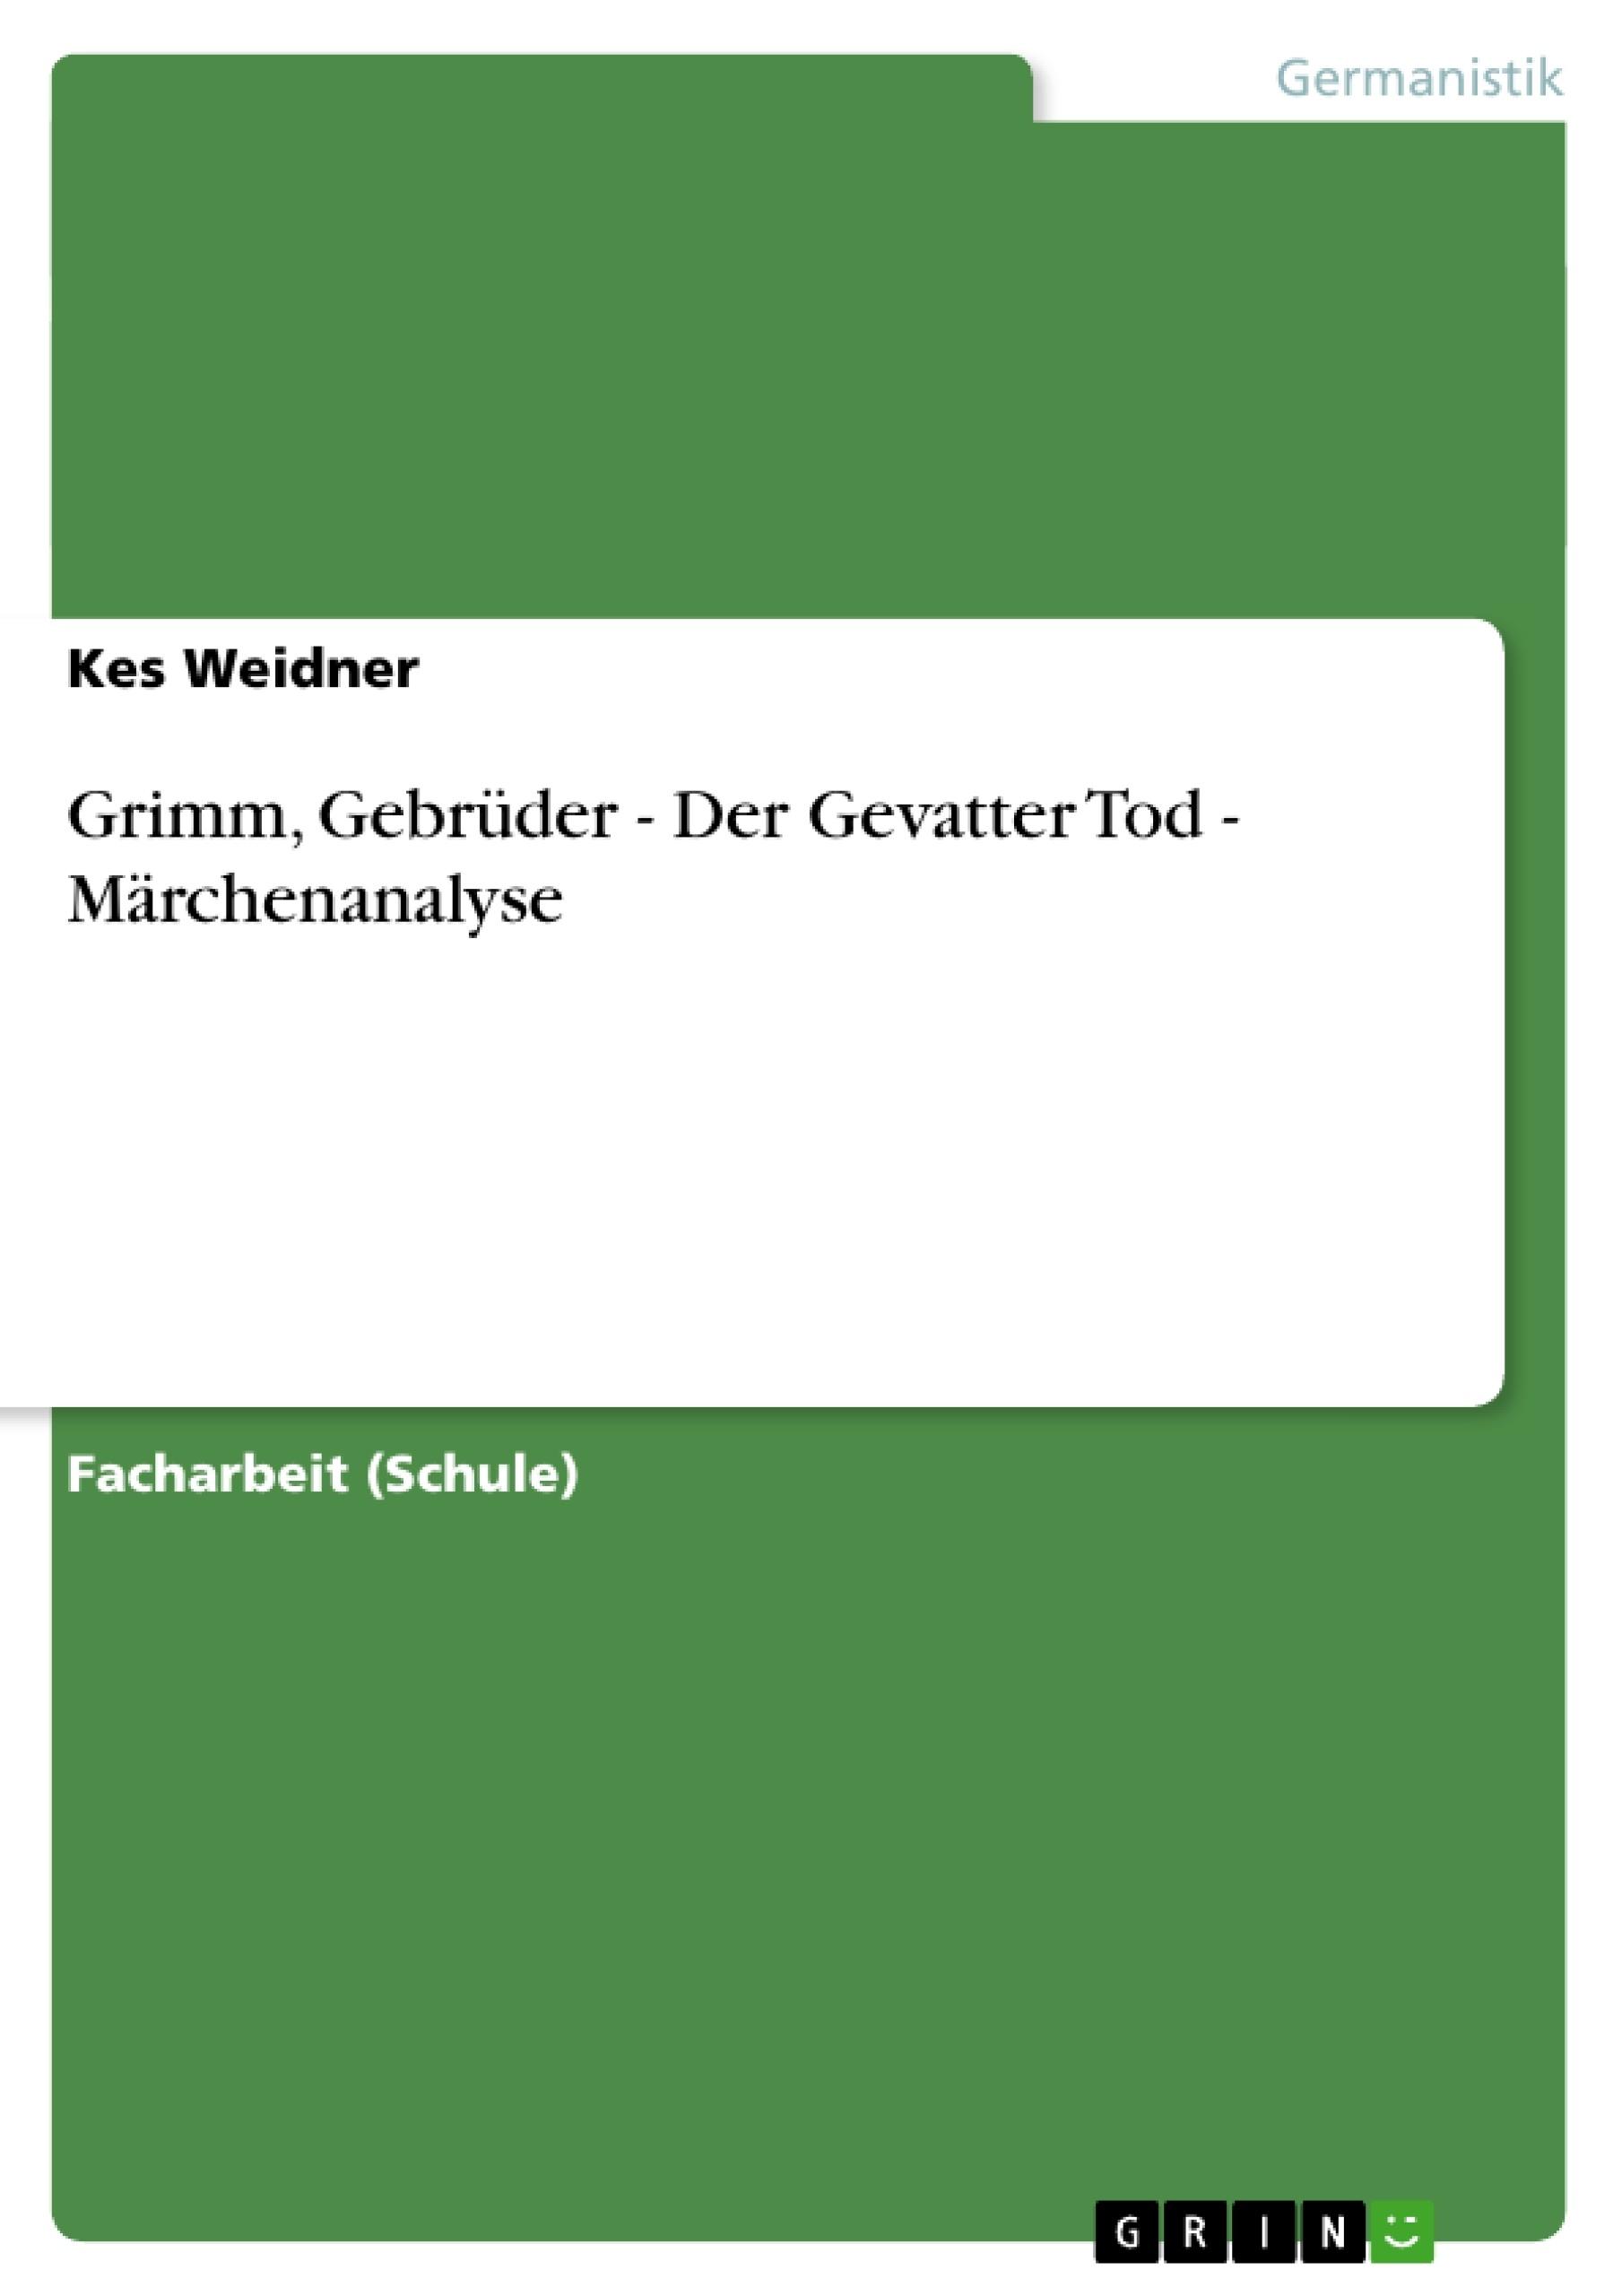 Titel: Grimm, Gebrüder - Der Gevatter Tod - Märchenanalyse